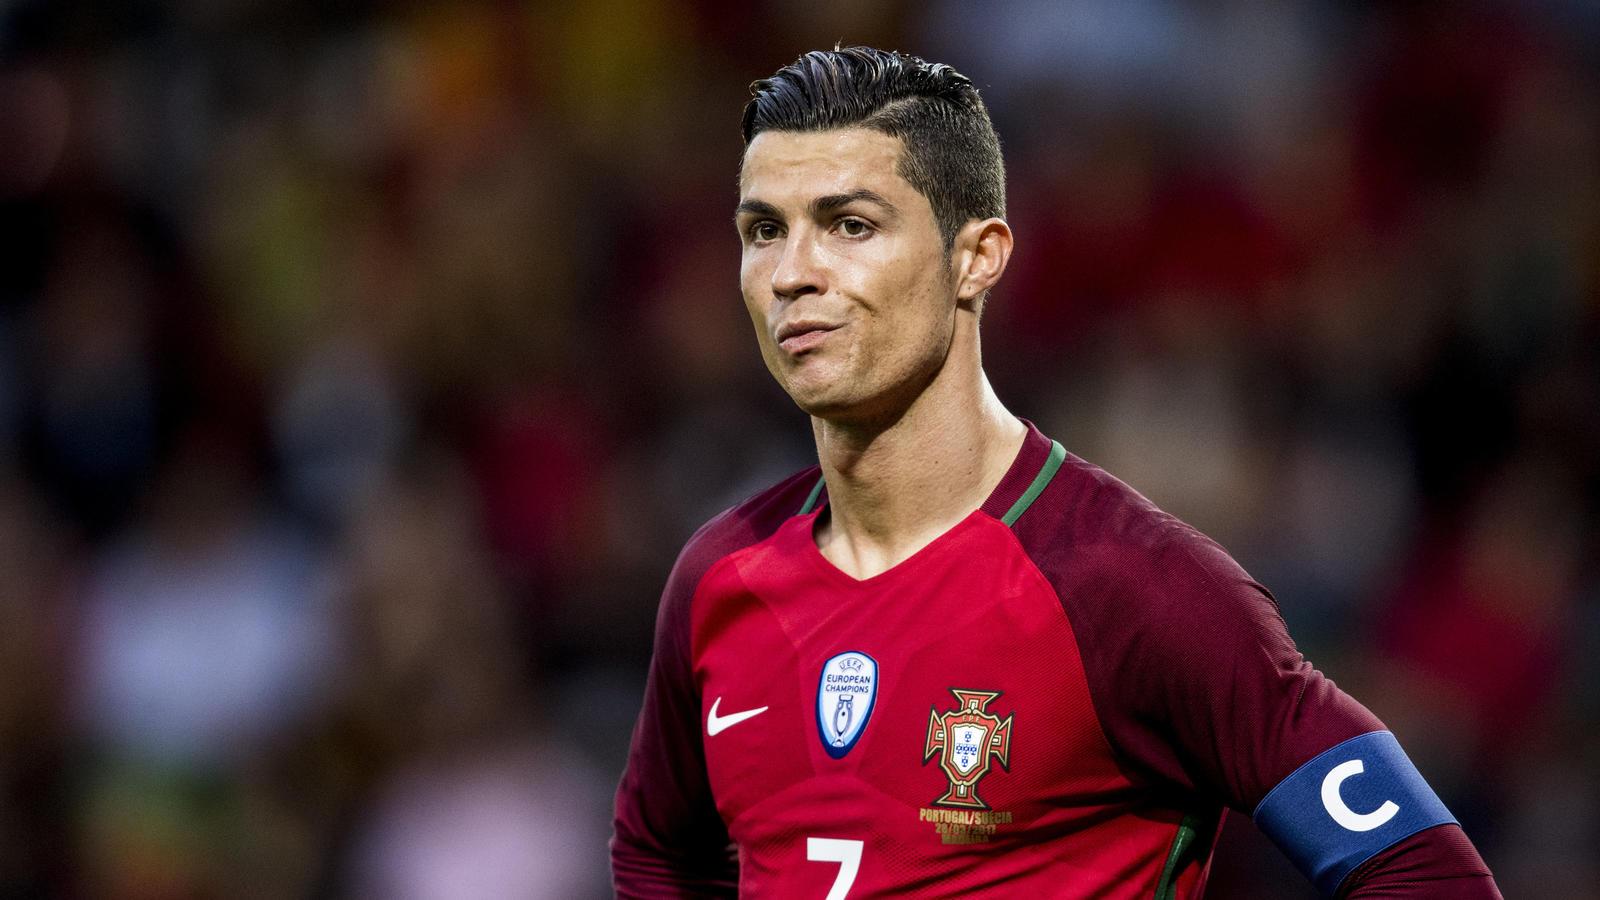 Cristiano Ronaldo Vergewaltigung